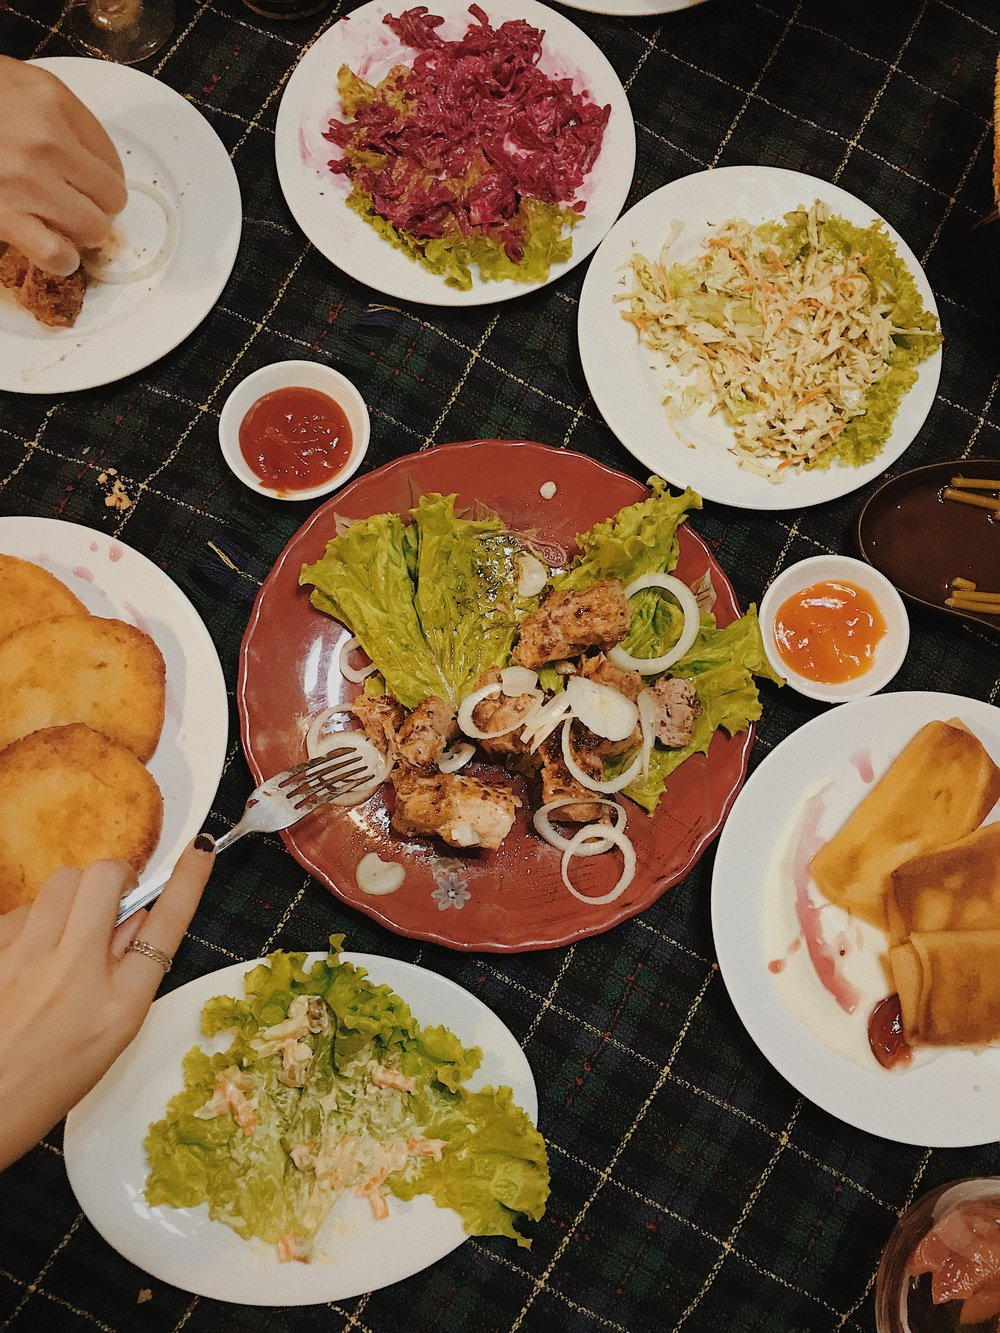 CCCP Restaurant & Cafe, Hà Nội